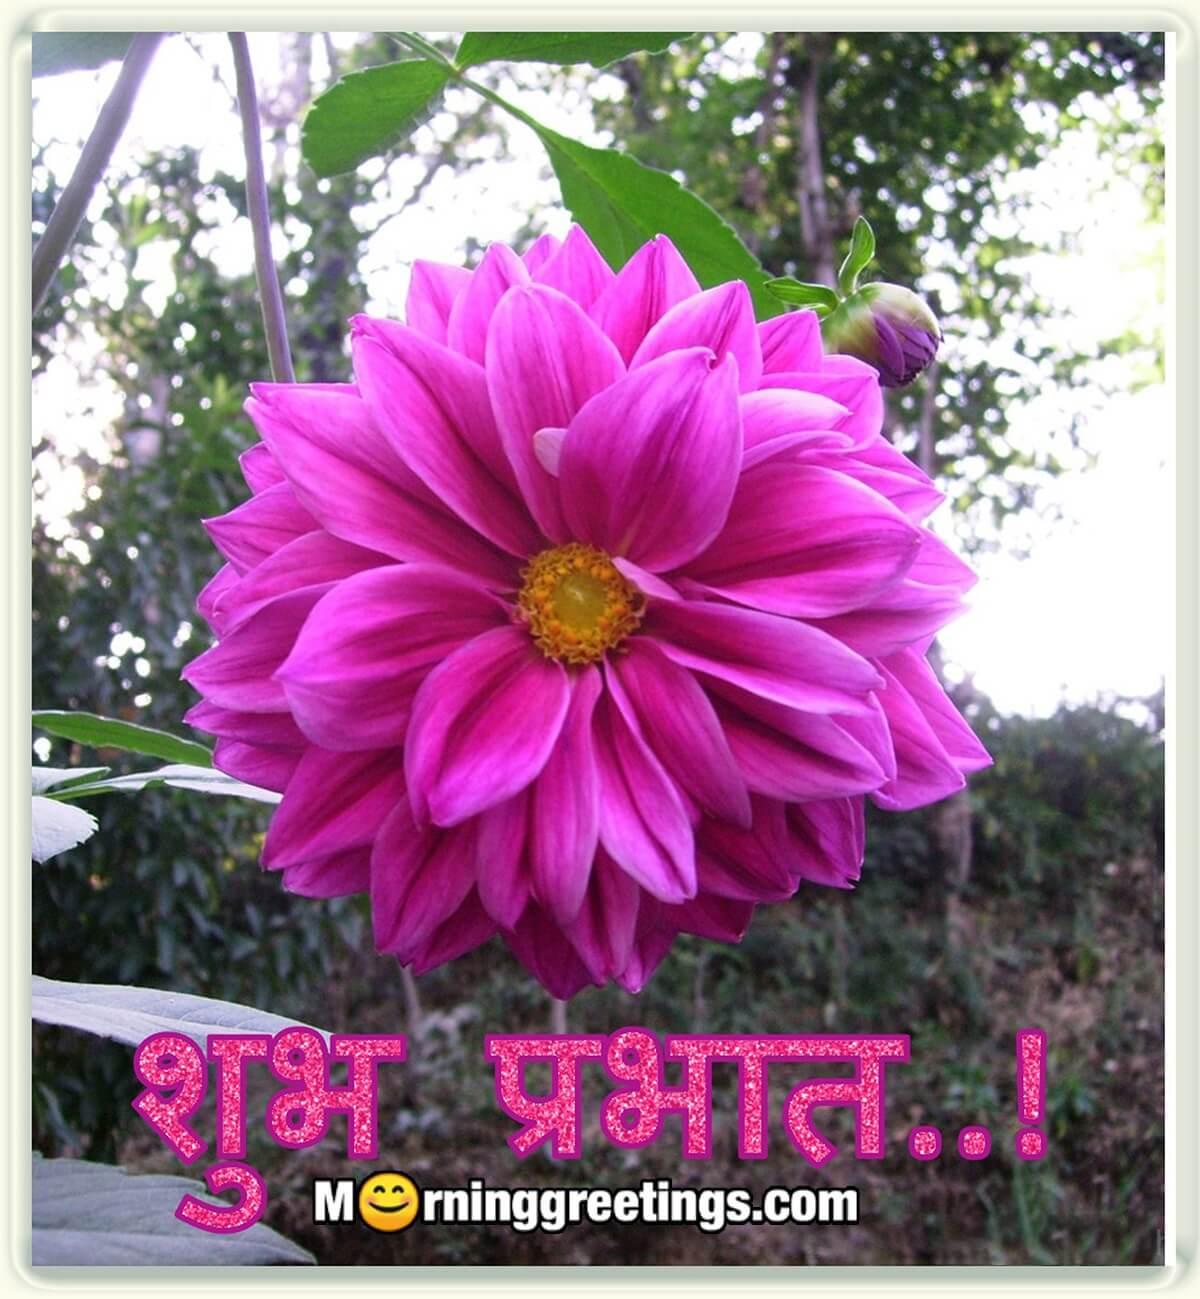 30 Good Morning Hindi Images - Morning Greetings – Morning ...